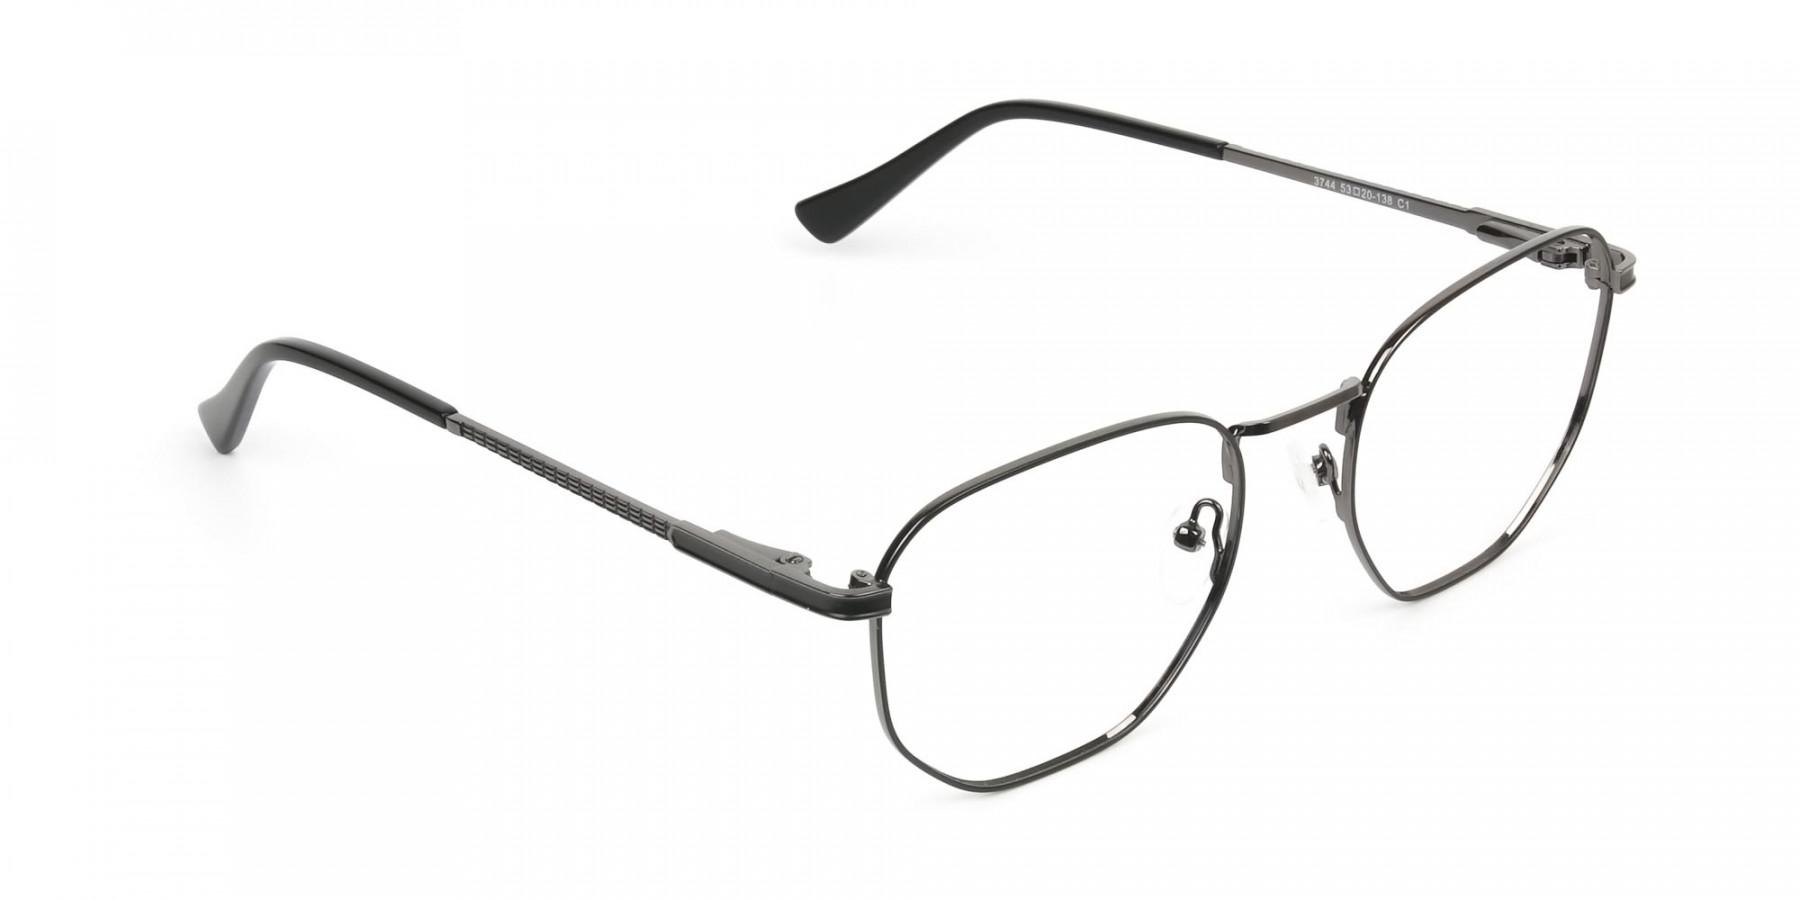 Lightweight Gunmetal Black Geometric Glasses - 1